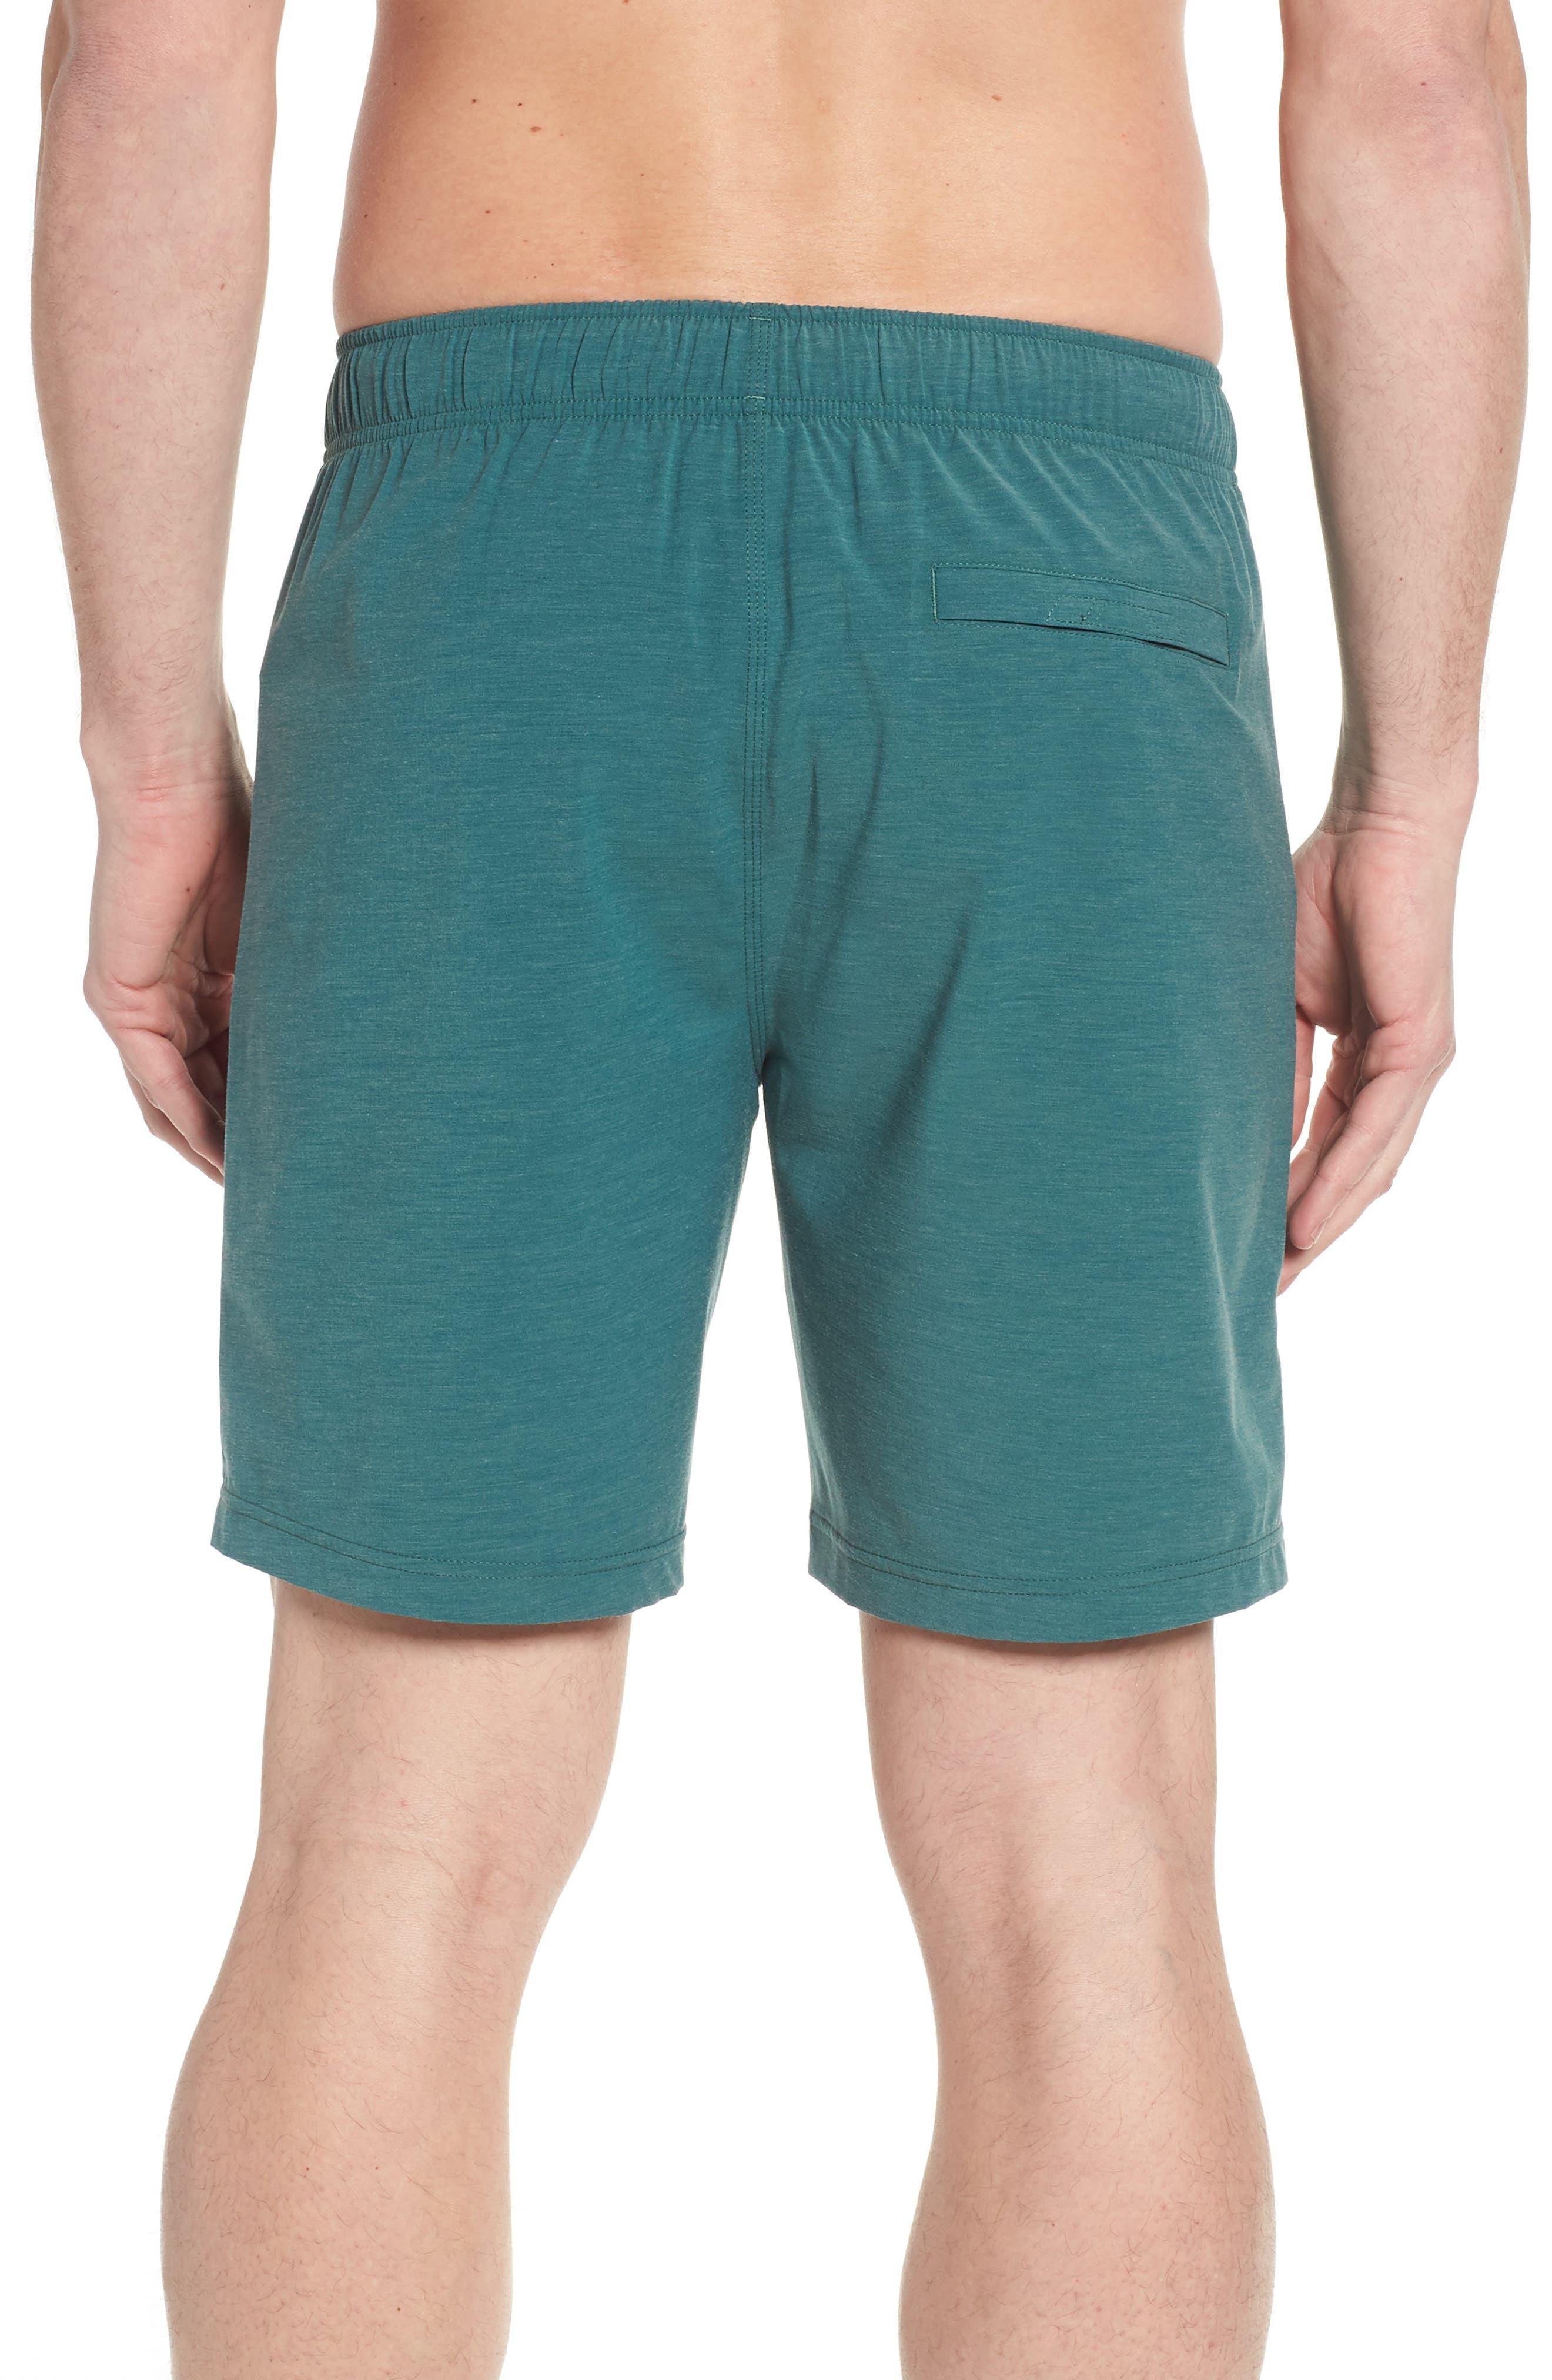 Metric Board Shorts,                             Alternate thumbnail 2, color,                             300